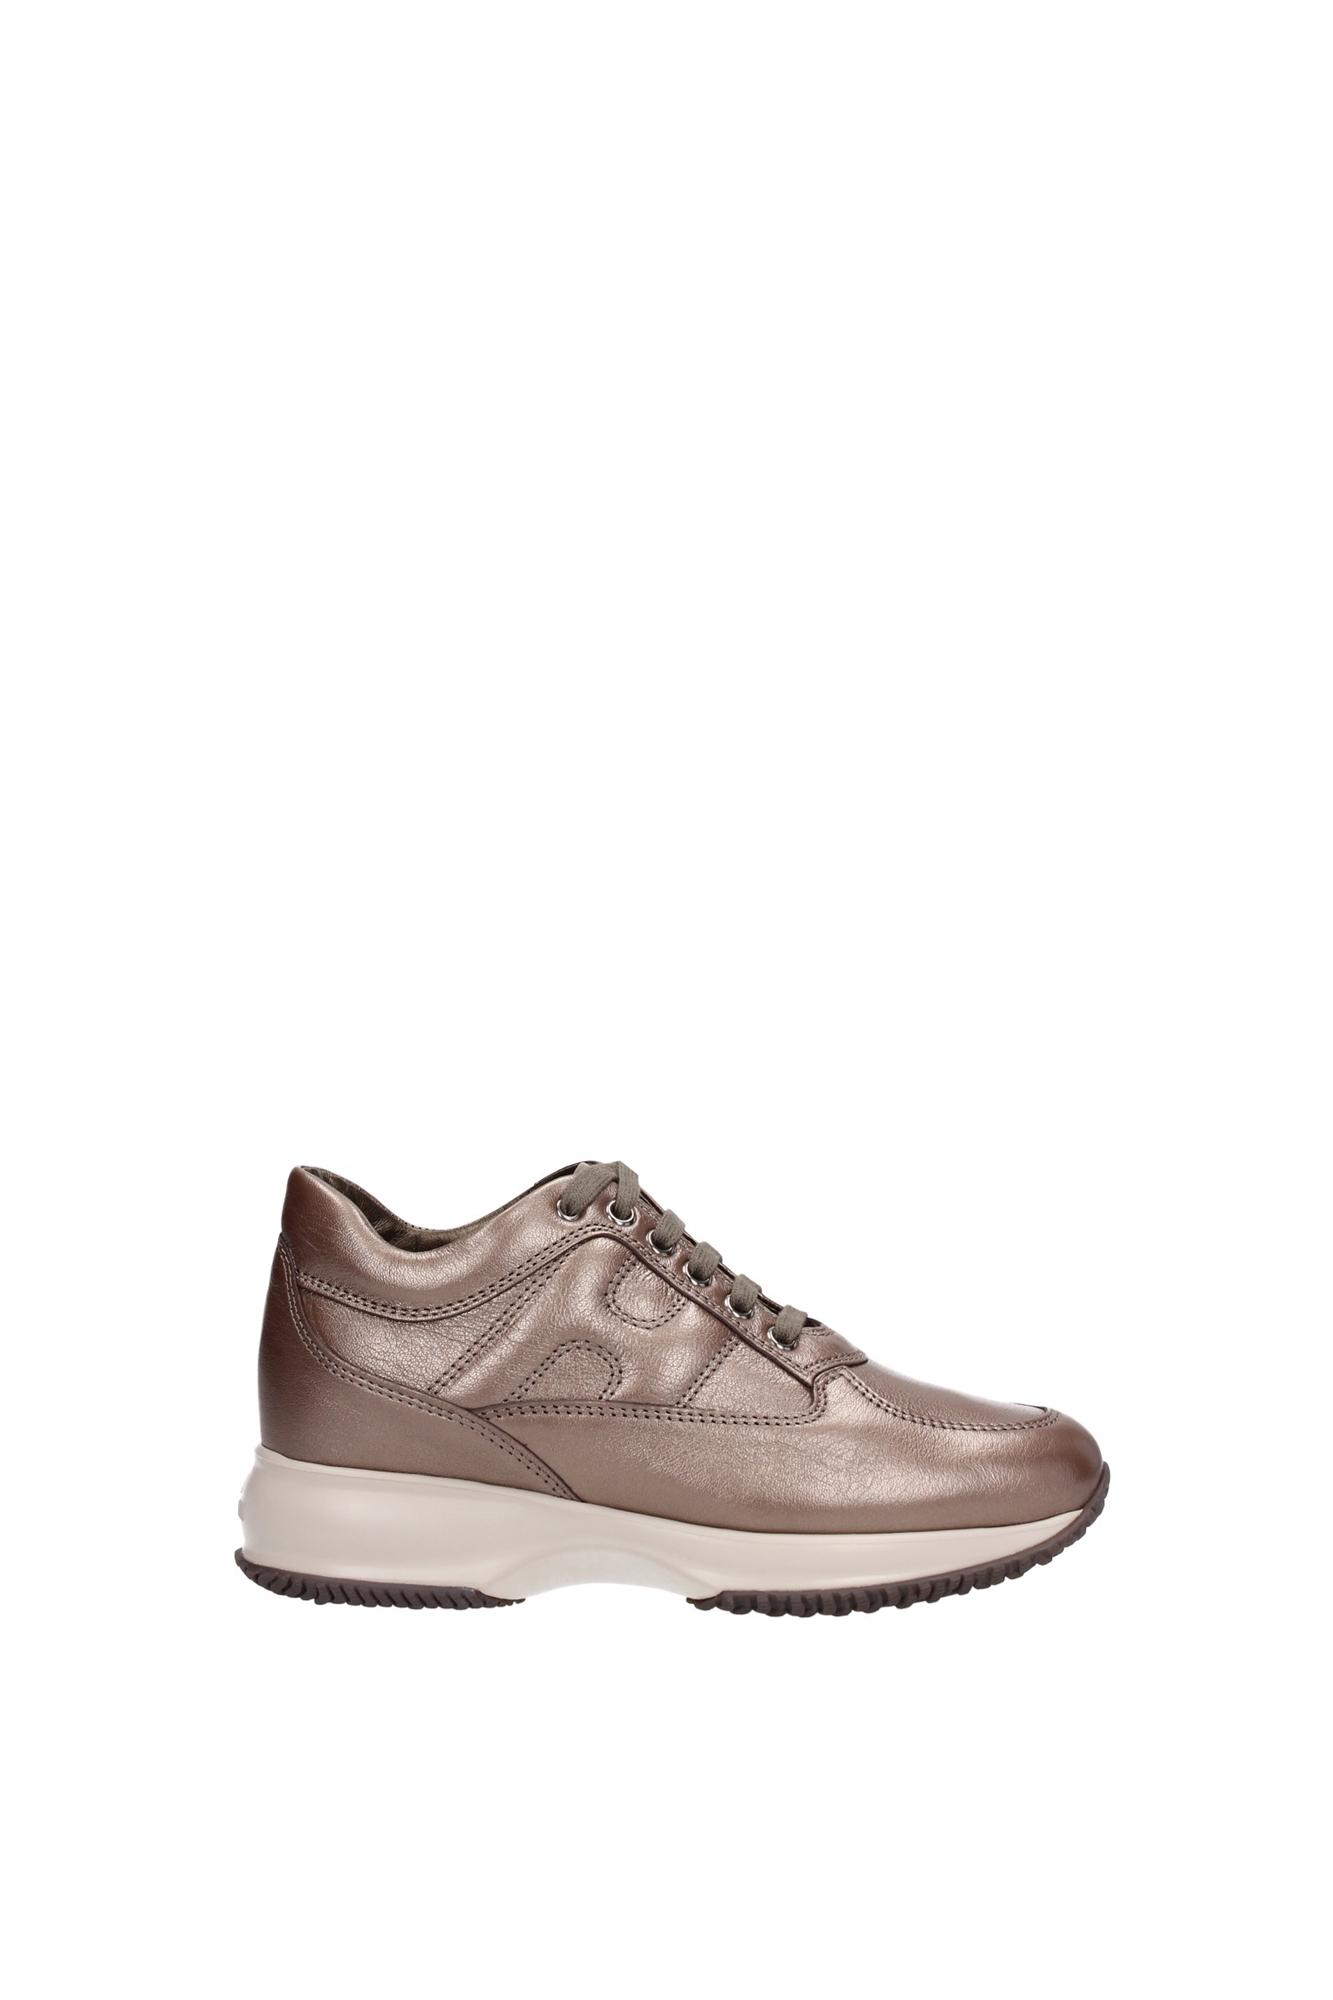 sneakers hogan damen leder braun hxw00n000106rrc407 ebay. Black Bedroom Furniture Sets. Home Design Ideas